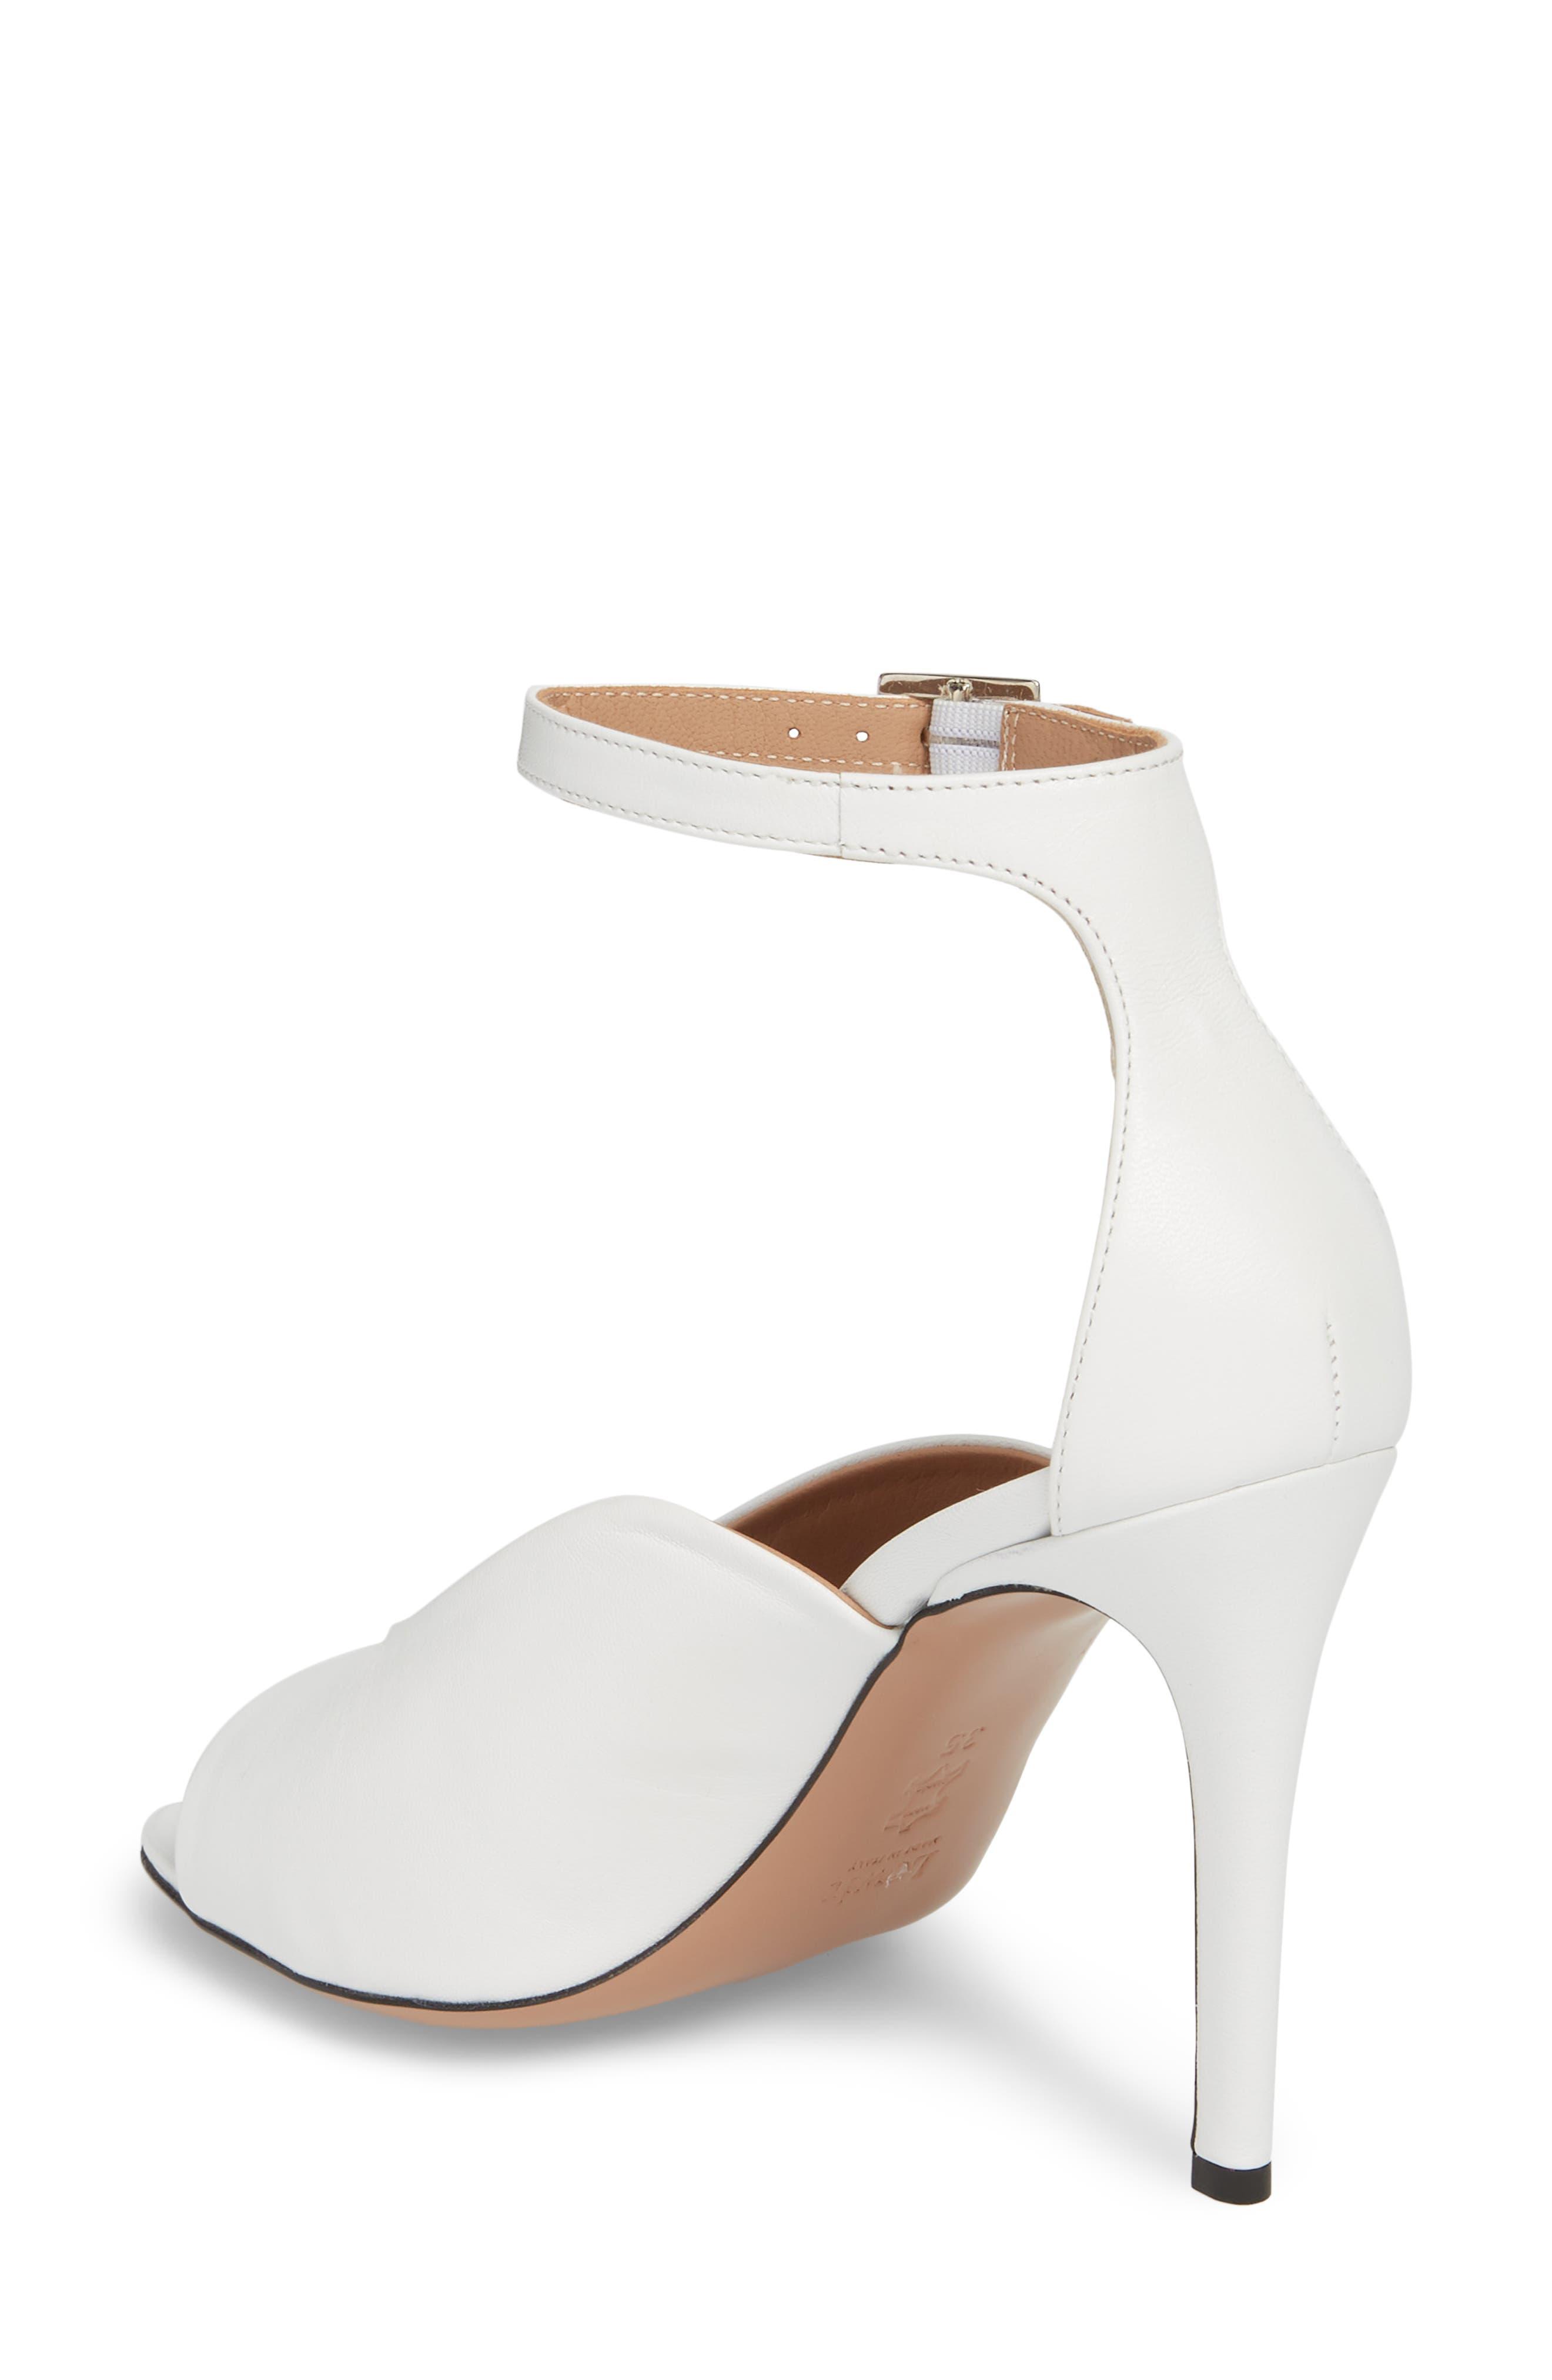 Rosalia Halo Strap Sandal,                             Alternate thumbnail 2, color,                             White Leather